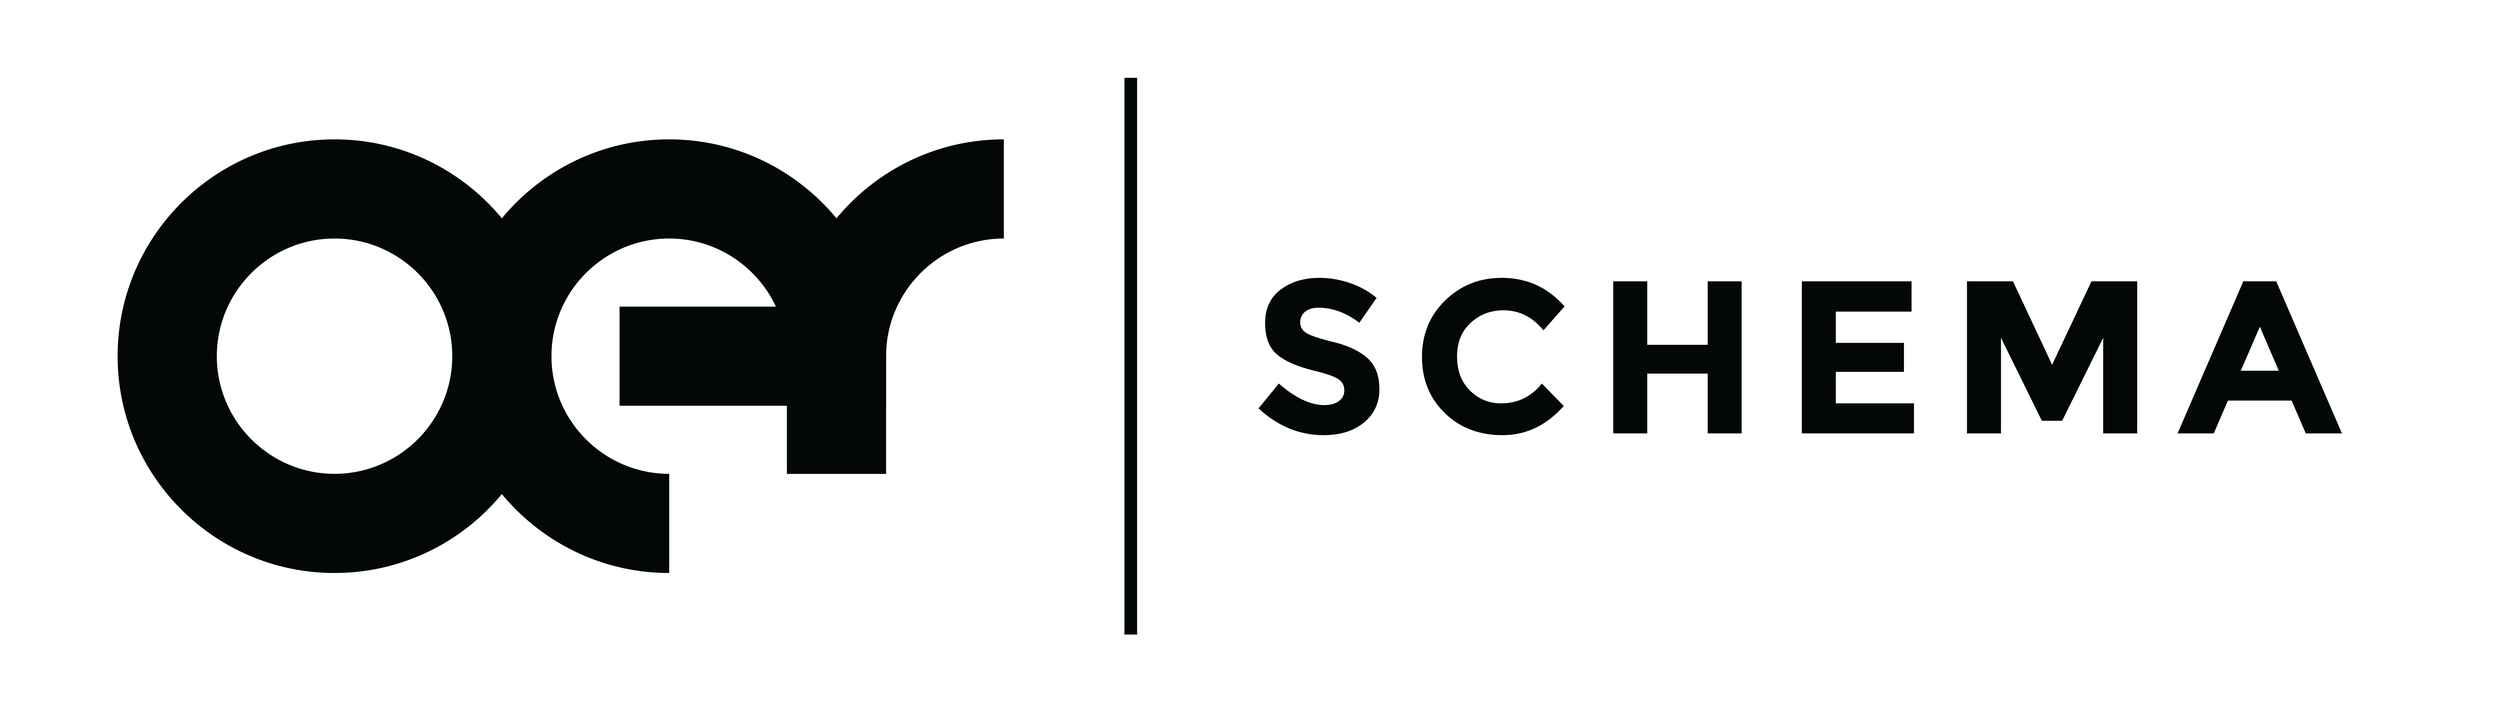 OER Schema logo horizontal